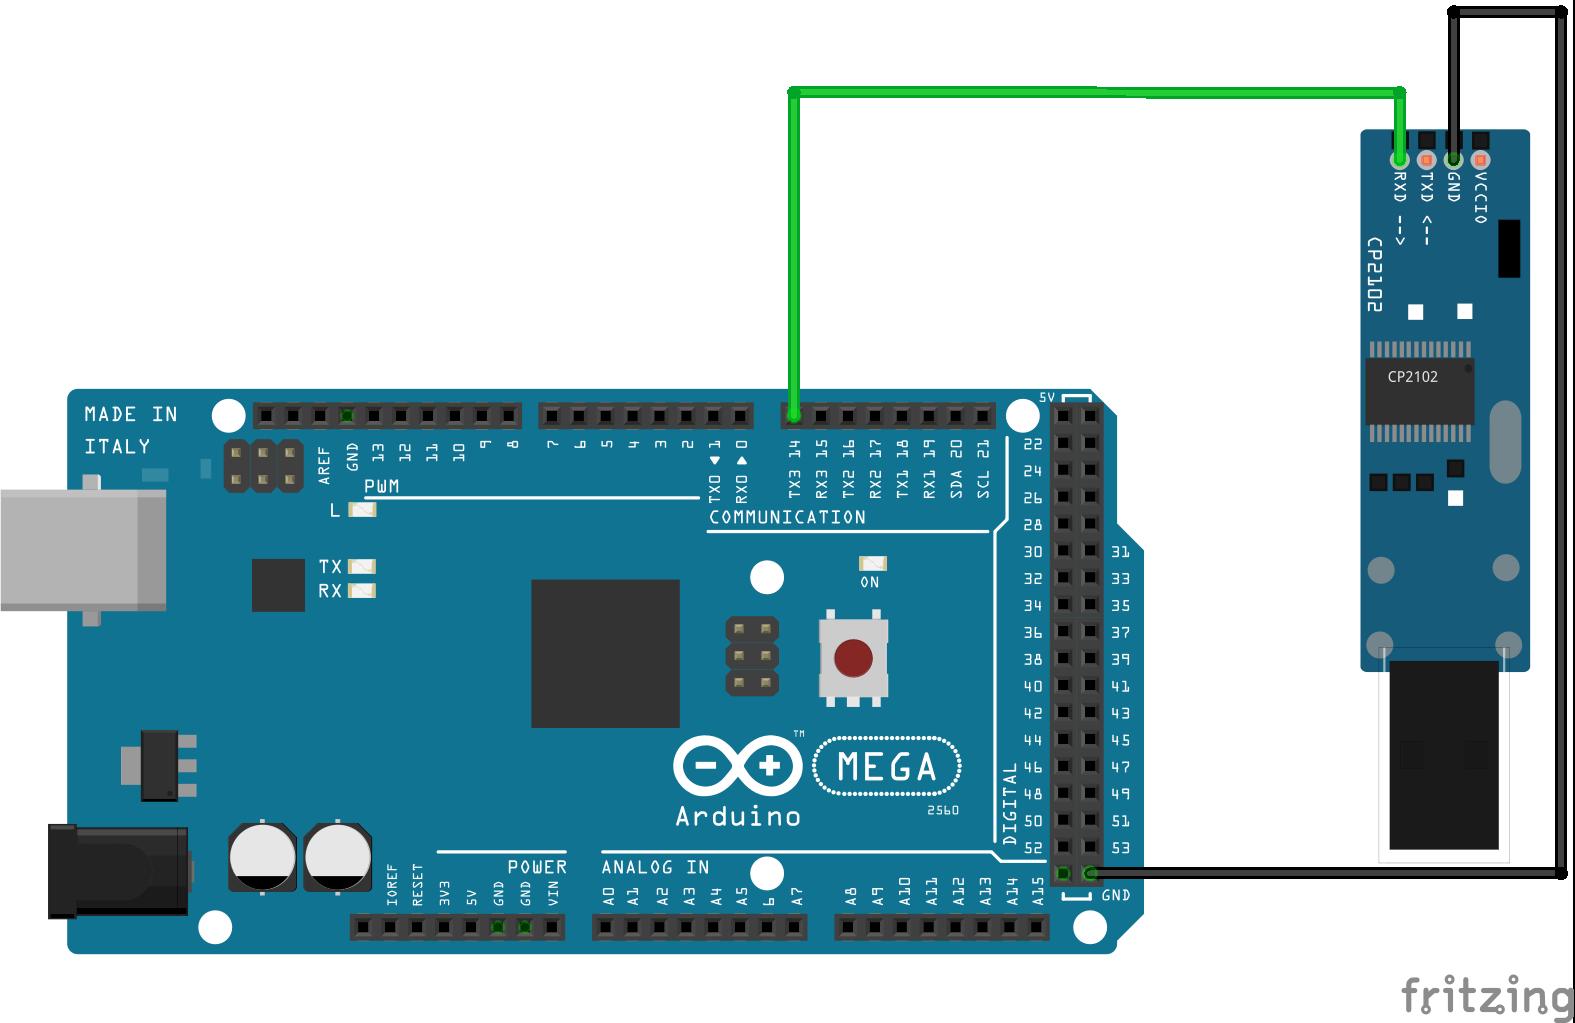 arti i237 i237 riistvaral hedane programmerimine 2016 rh git wut ee connect arduino mega to wifi wiring arduino mega